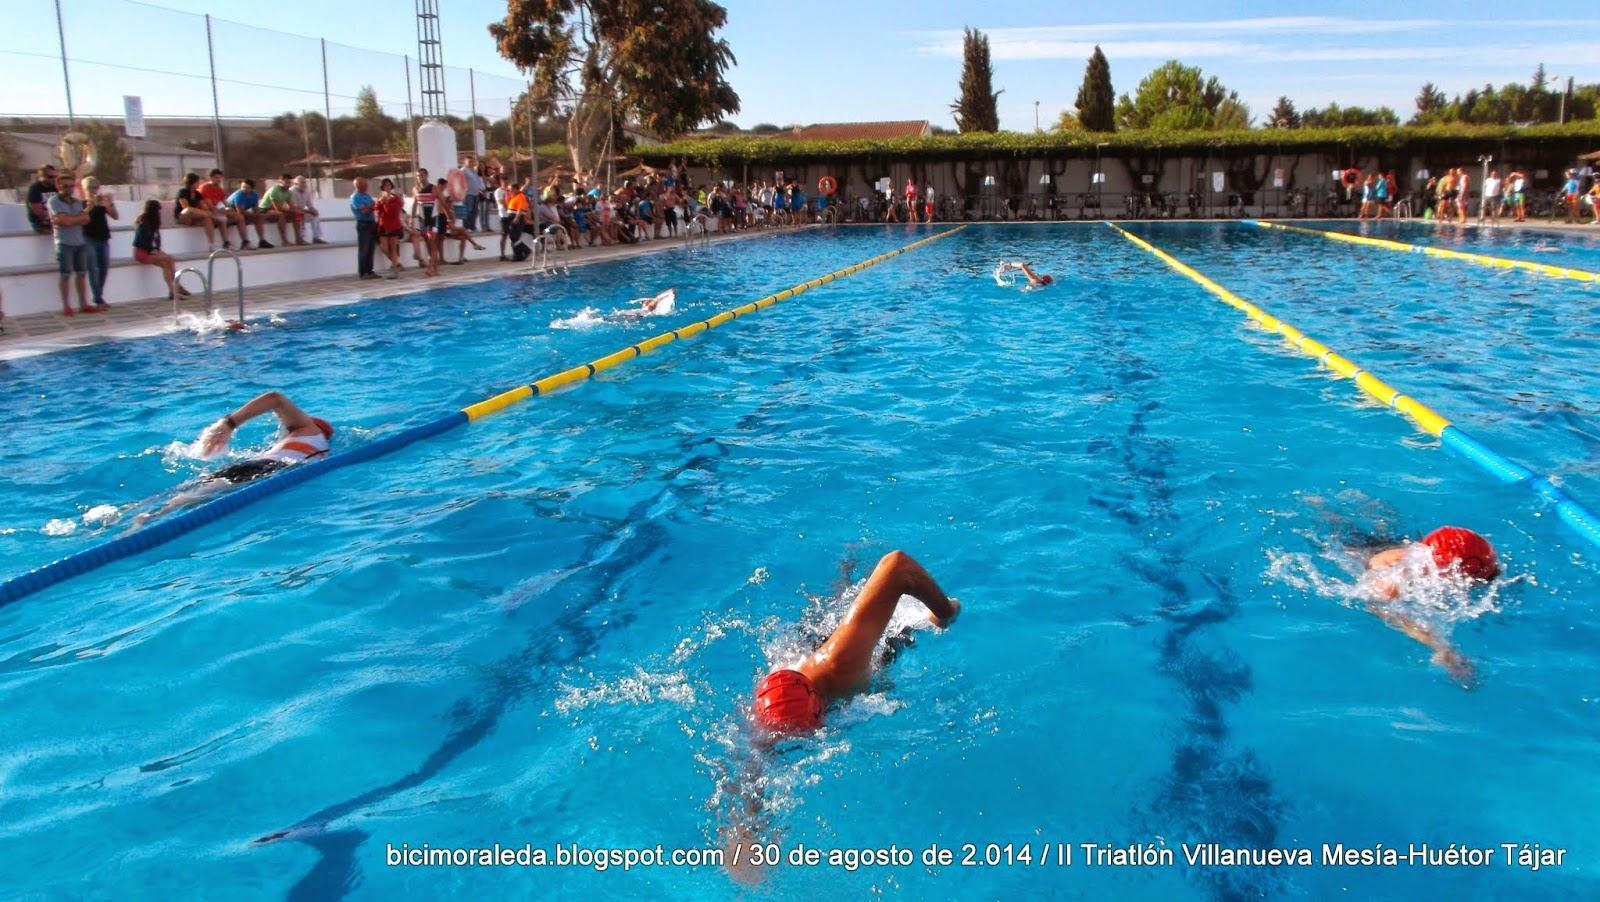 Loma linda y bicimoraleda experience ii triatl n cross for Piscina municipal de granada